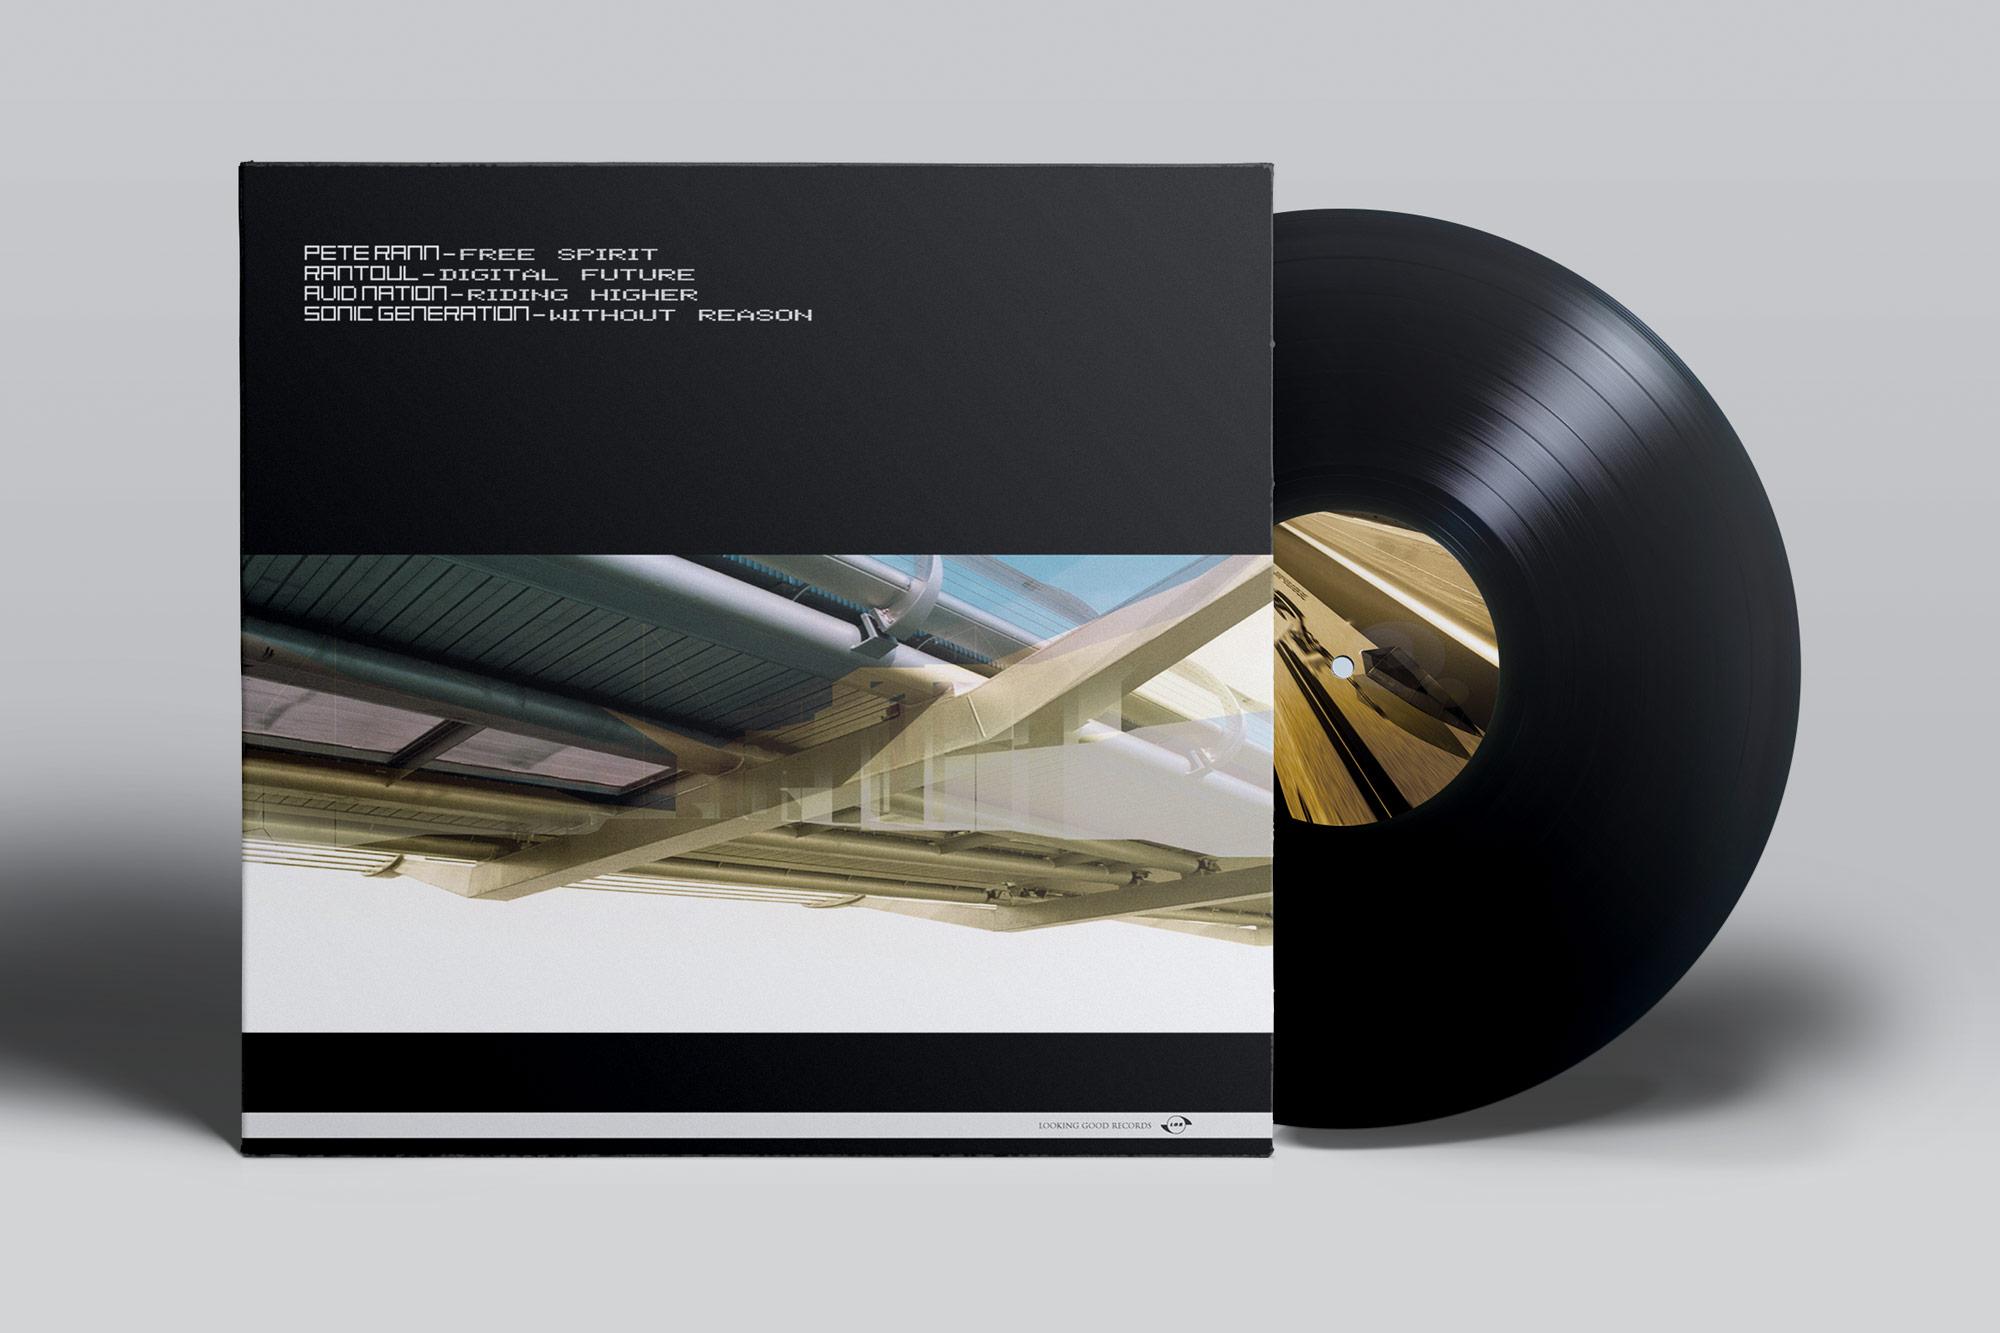 gareth-paul-jones-studio-design-looking-good-records-12-covers-cs-08-LGR038-LGR039